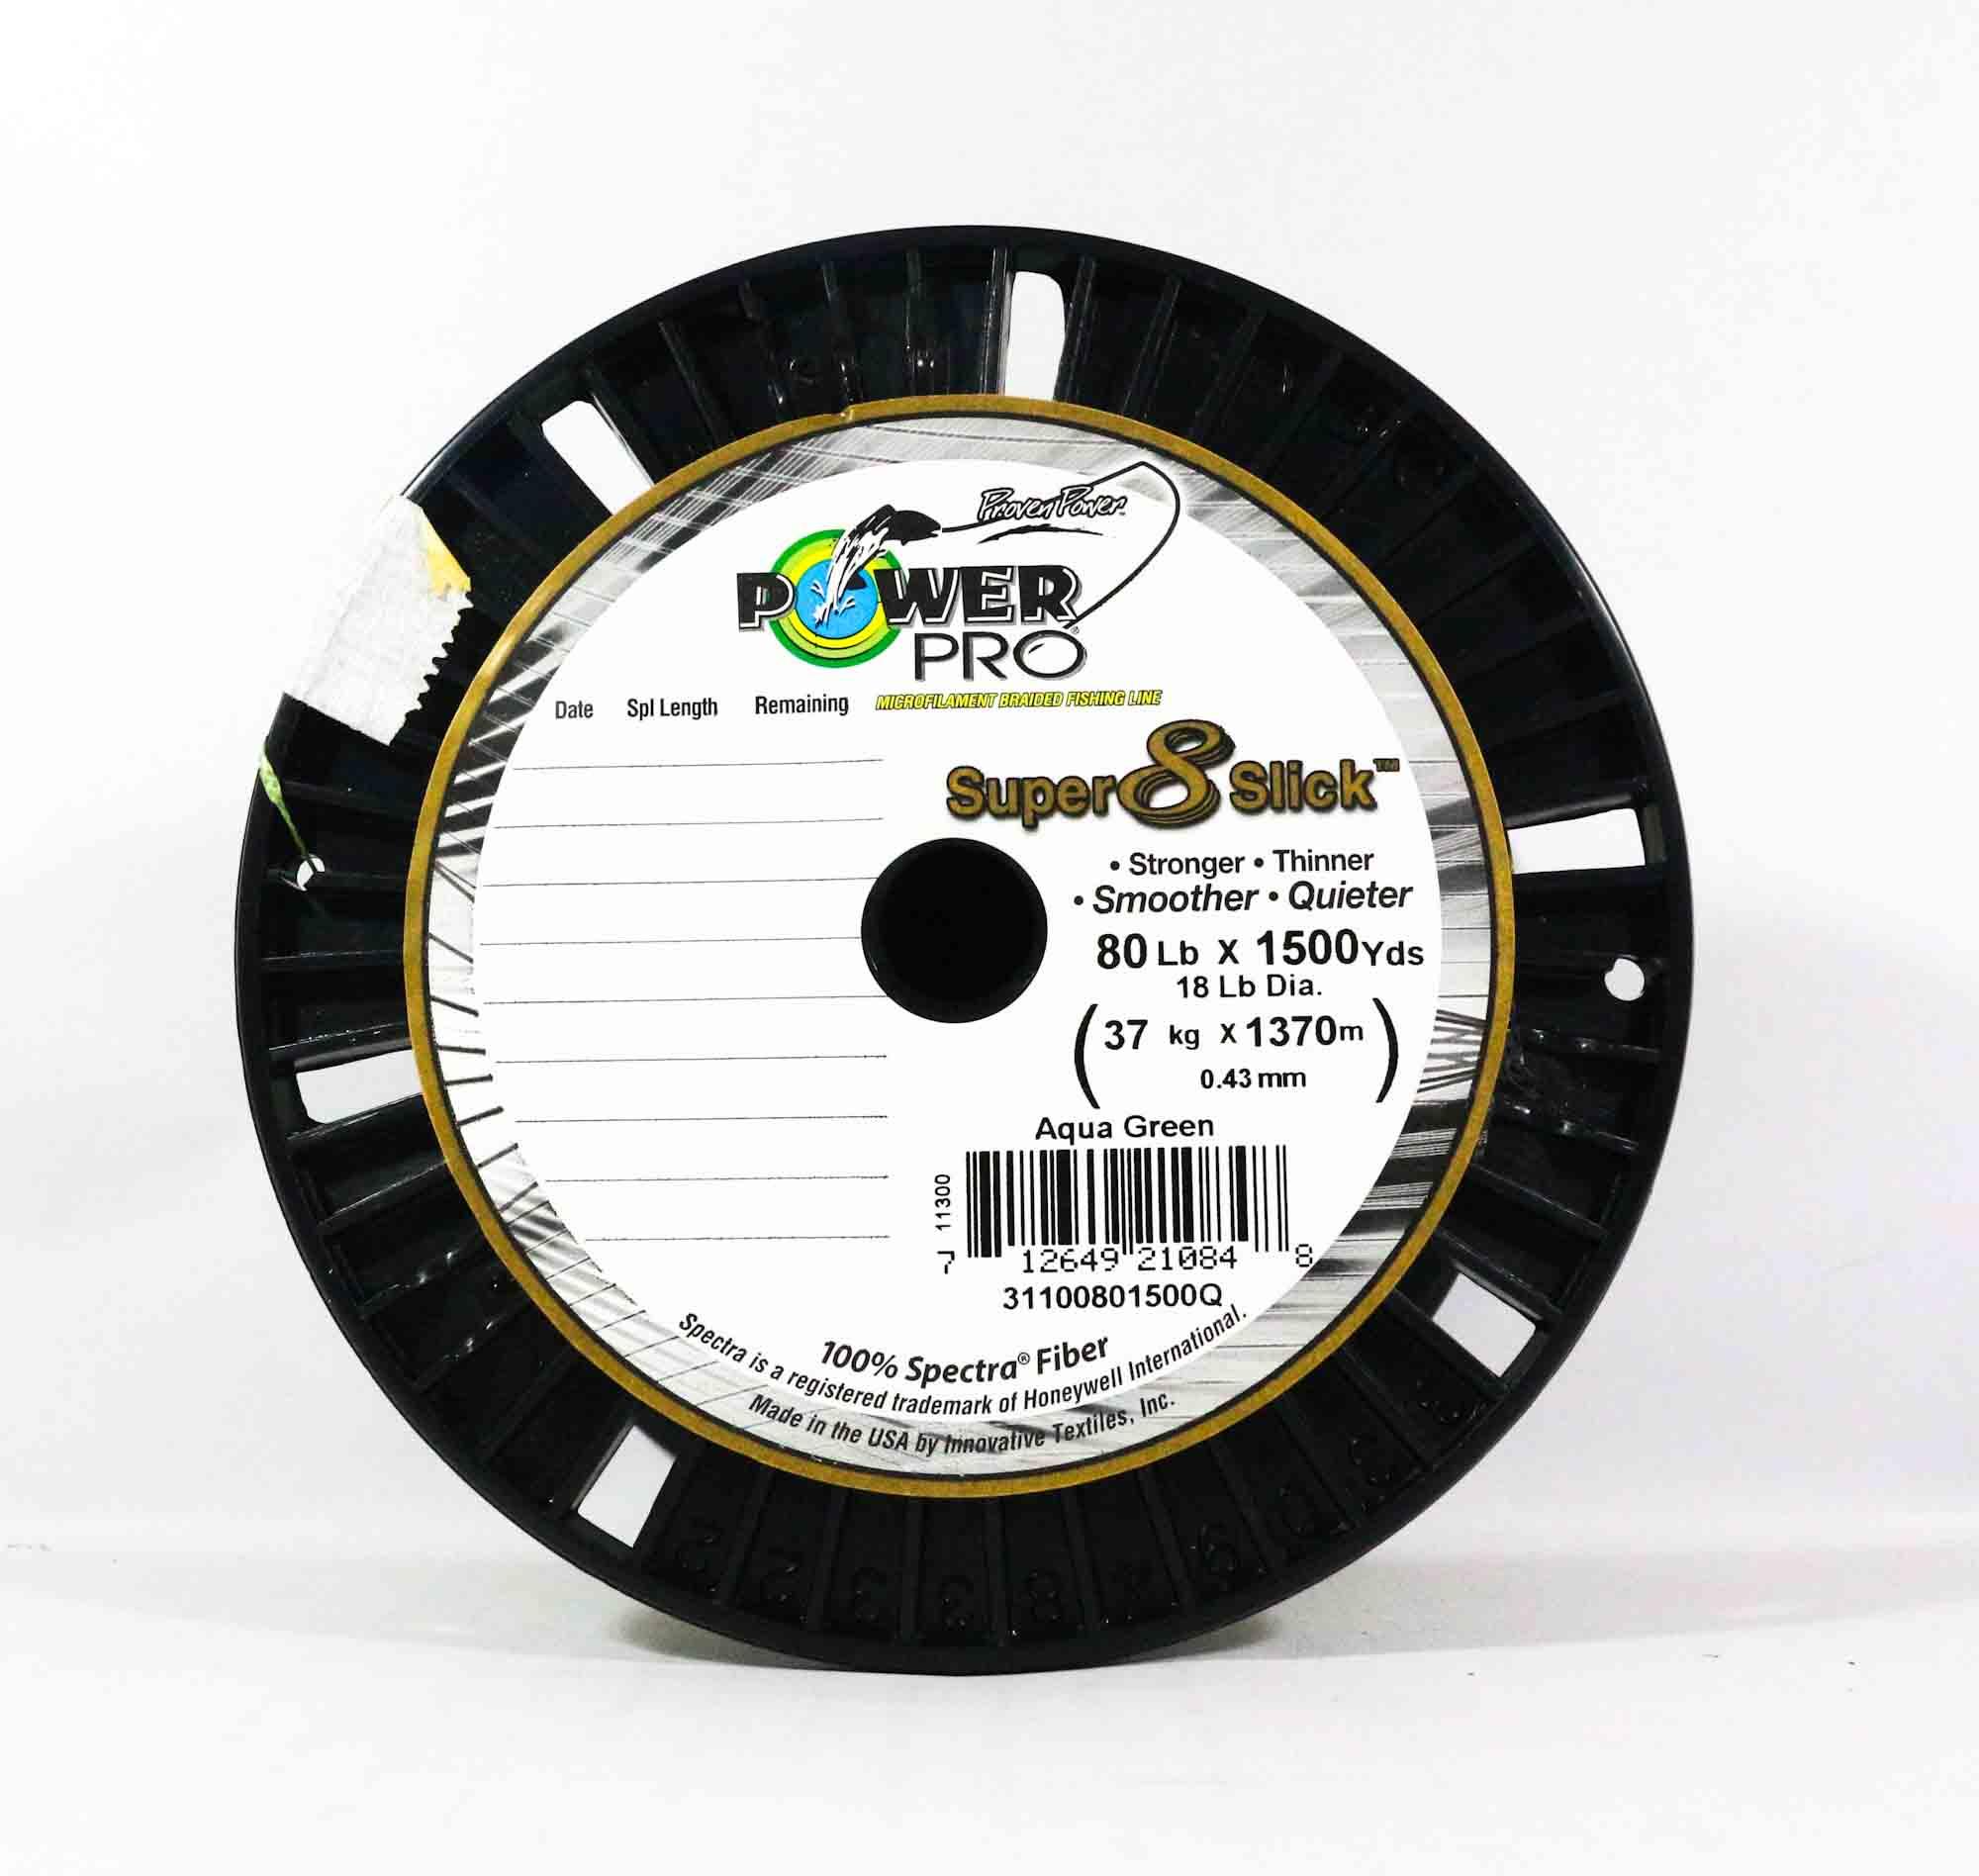 Sale Power Pro Super 8 Slick Spectra Line 80lb by 1500yds Green (0848)